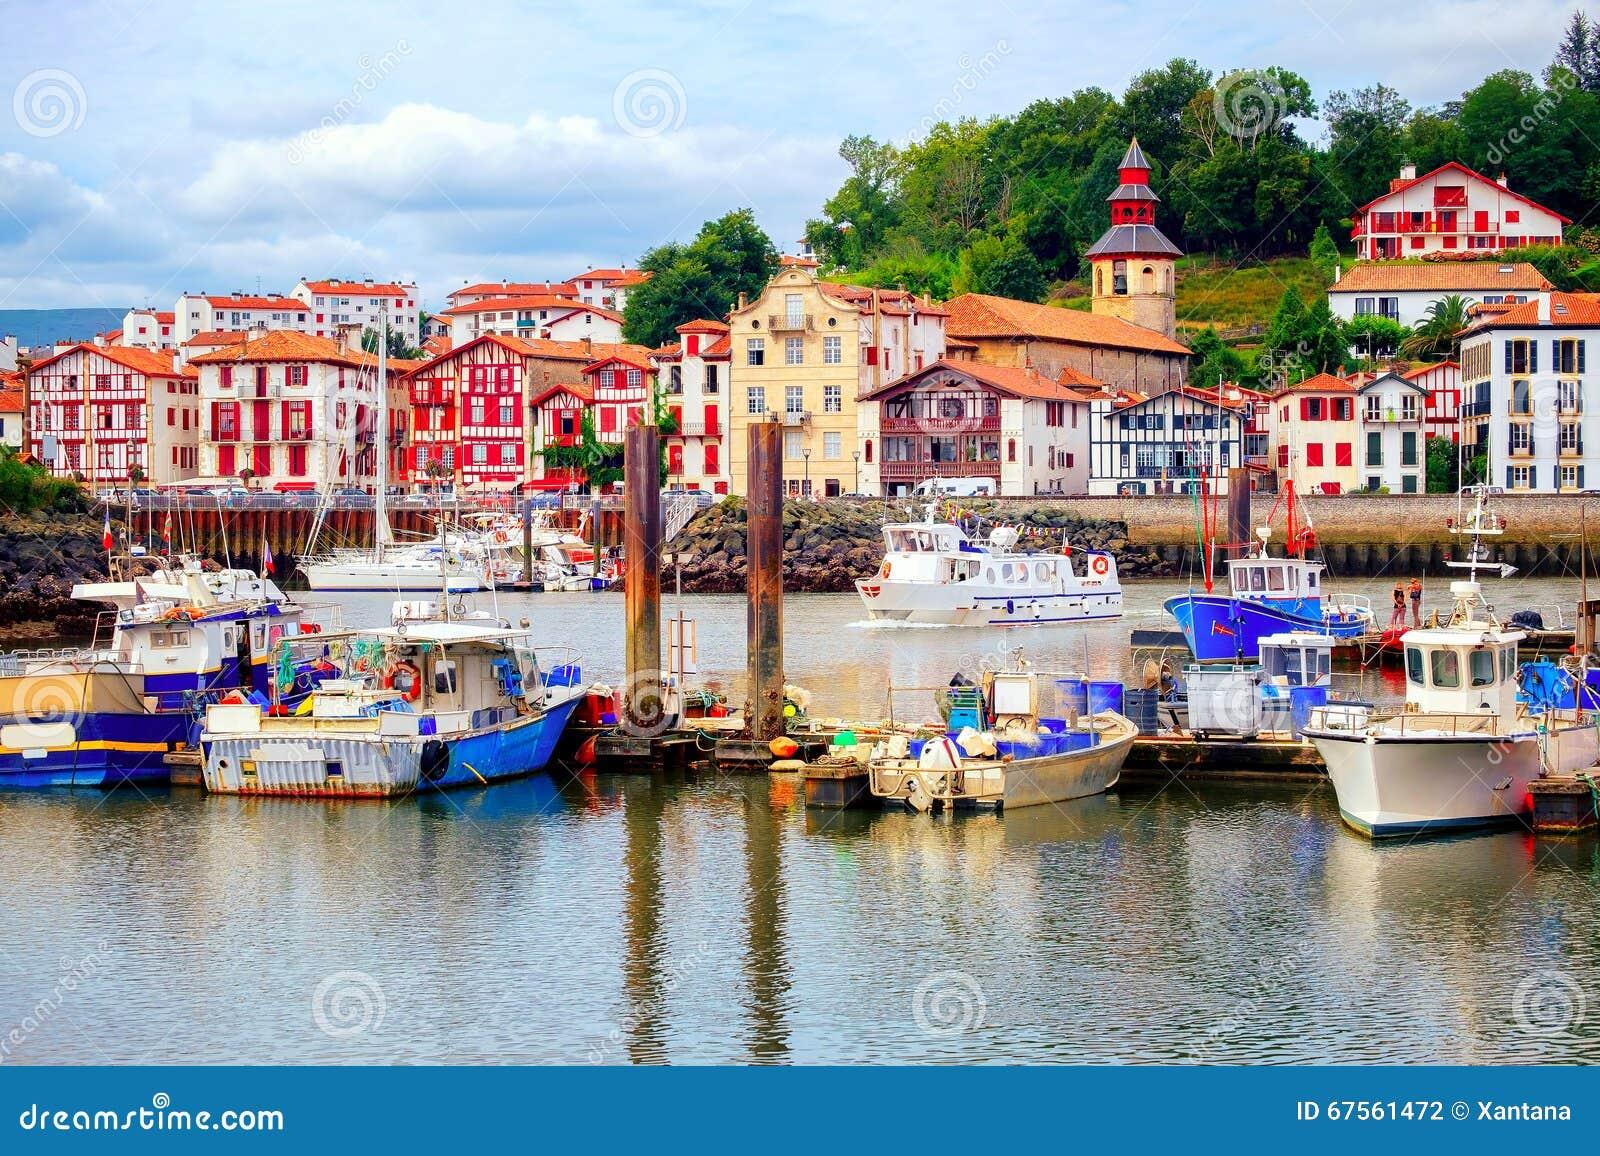 colorful basque houses in port of saint jean de luz france stock photo image of jean port. Black Bedroom Furniture Sets. Home Design Ideas